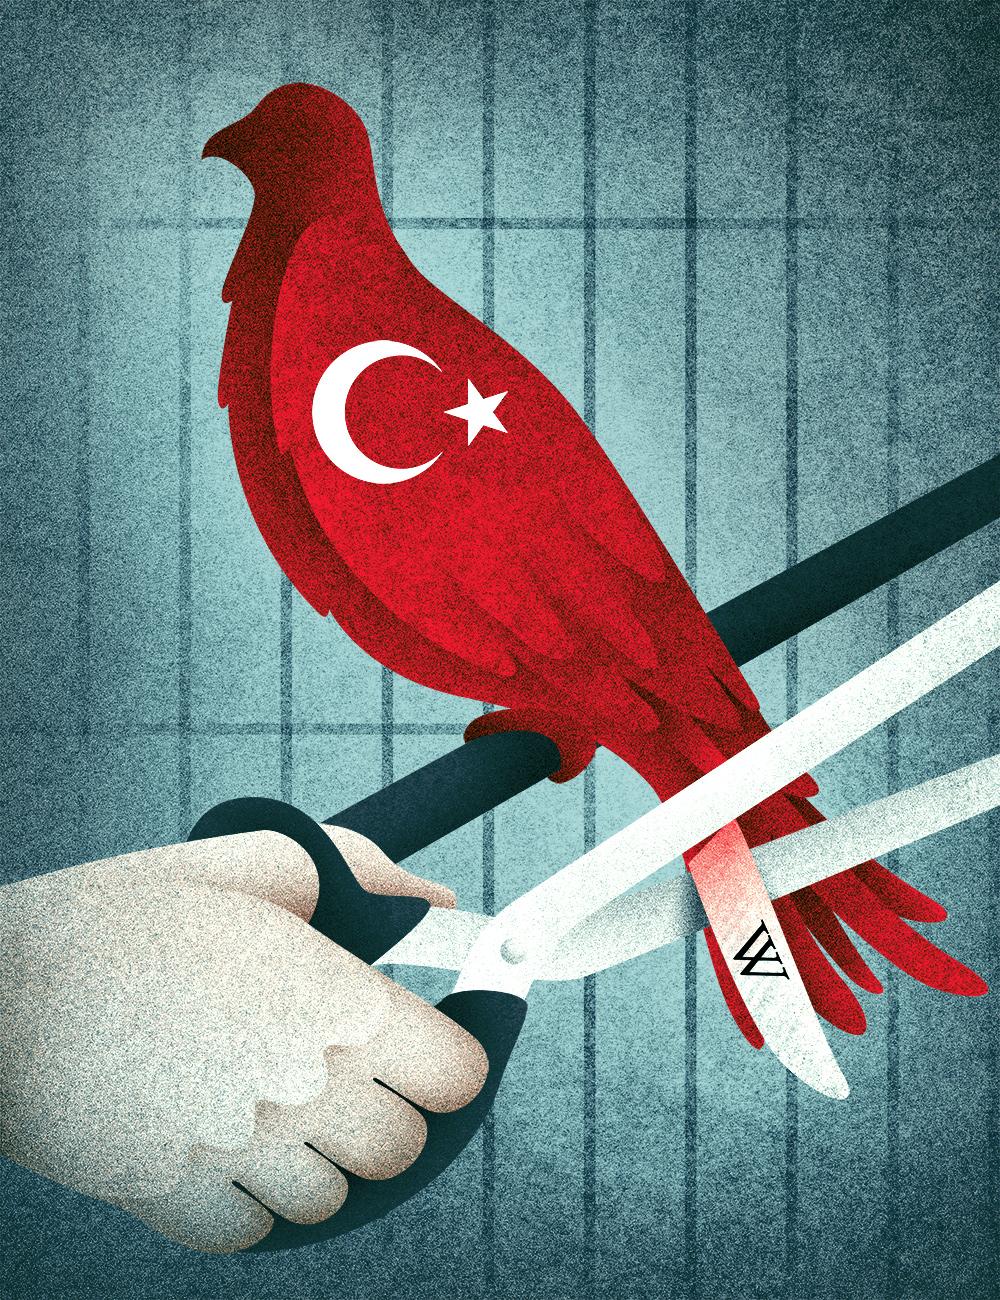 Turkey blocks access to Wikipedia. by Paolo Beghini - Creative Work